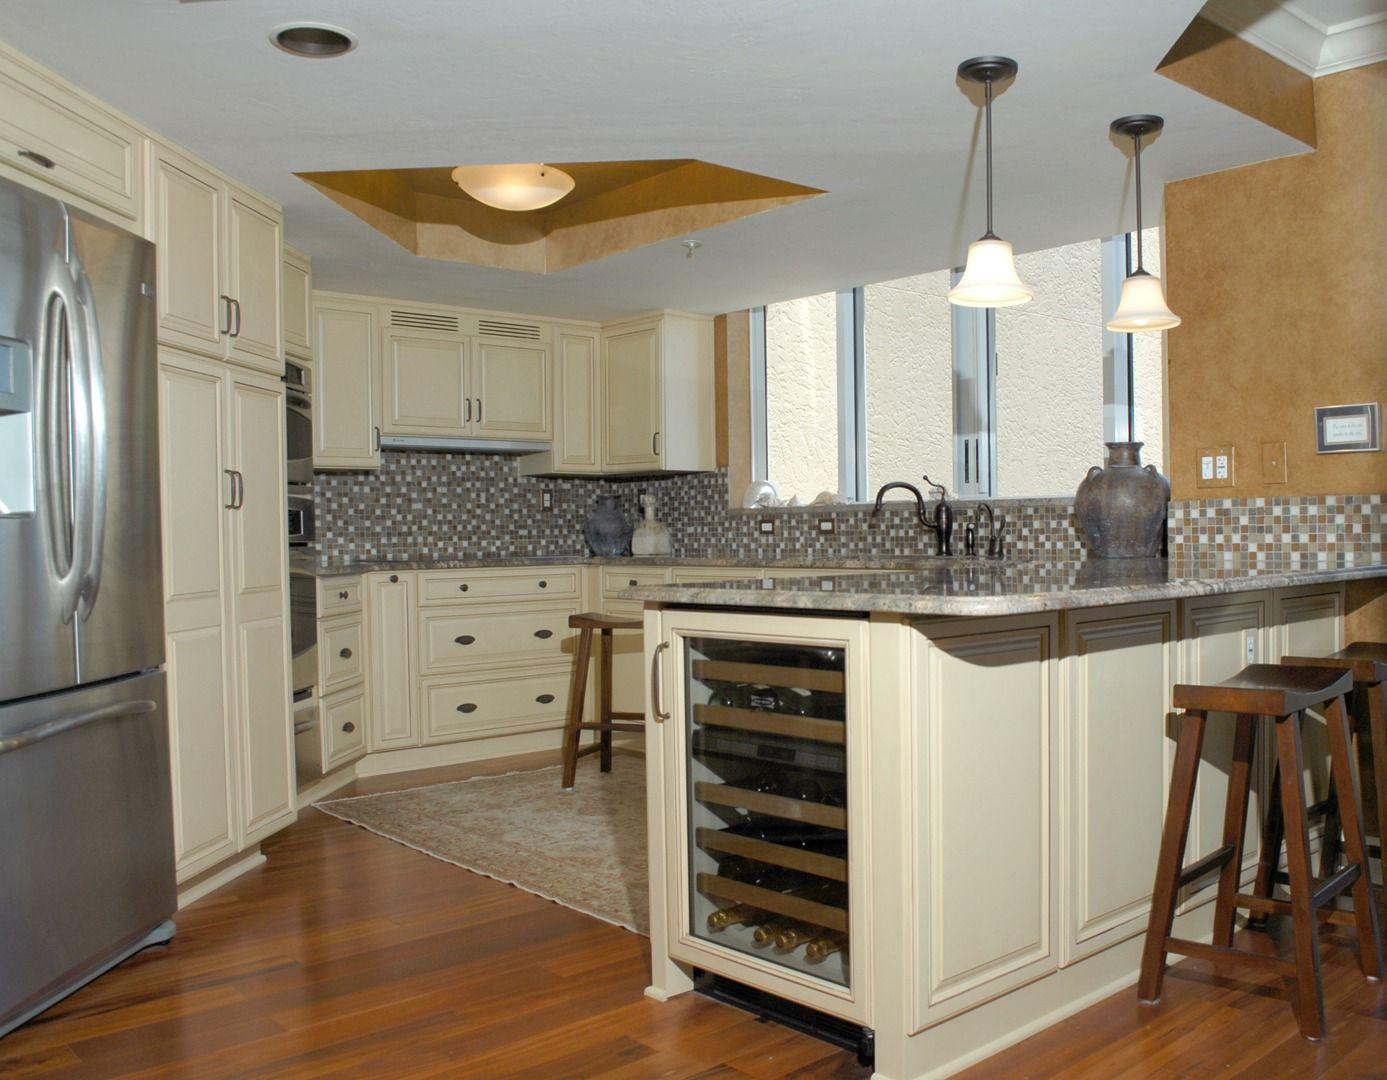 Remodeling Kitchens And Bathrooms Alley Design To Build Naples Fl Kitchen Remodel Kitchen Cabinet Remodel Transitional Kitchen Design